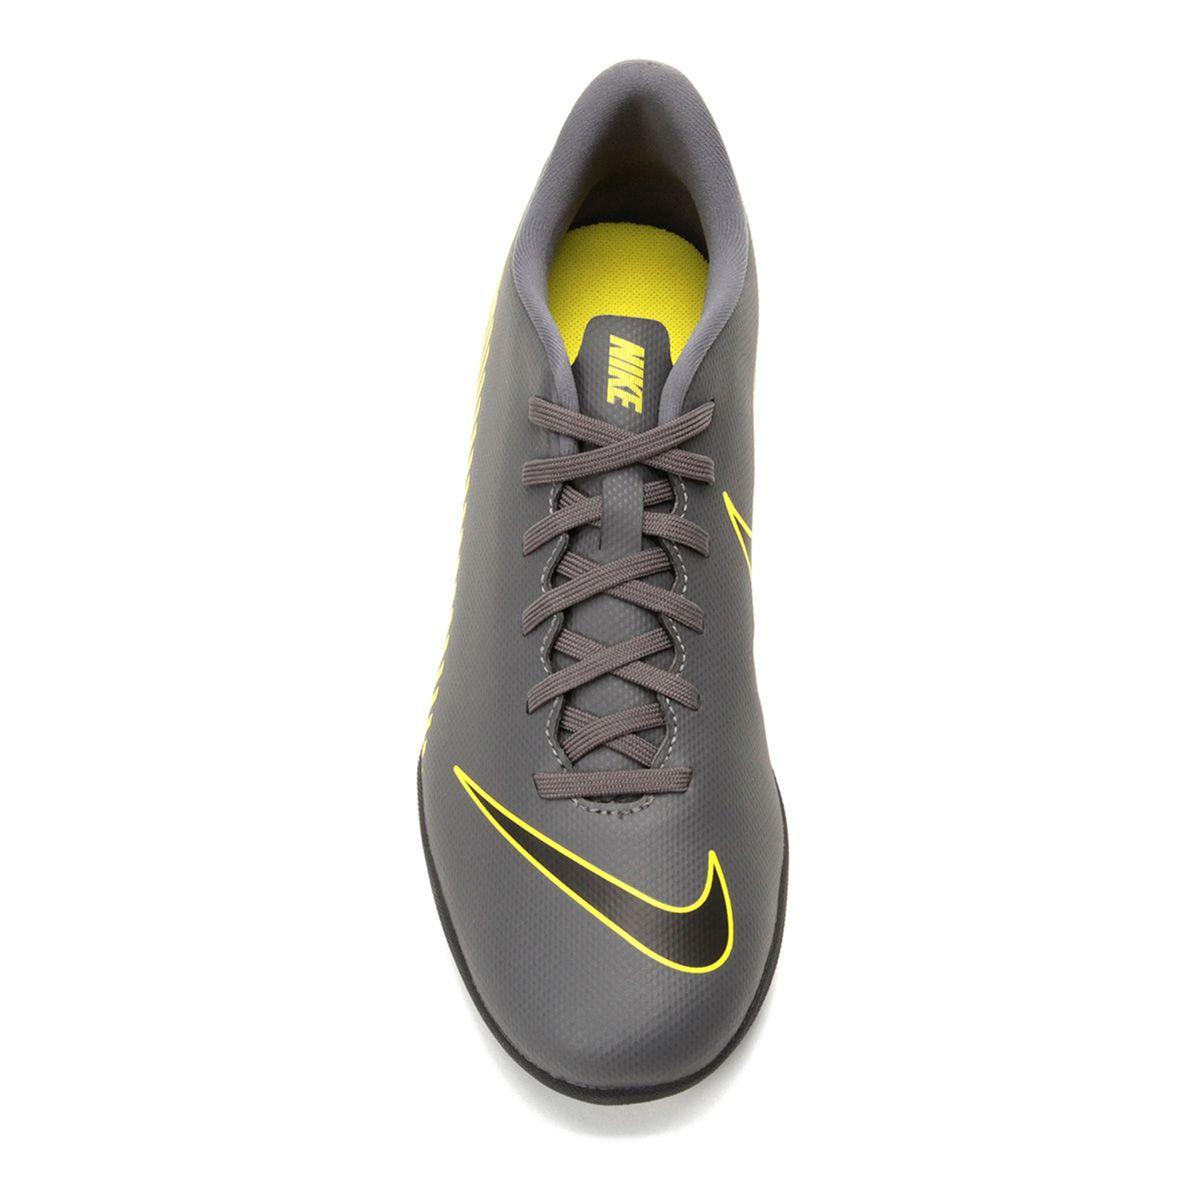 Chuteira Society Nike Vapor 12 Club TF